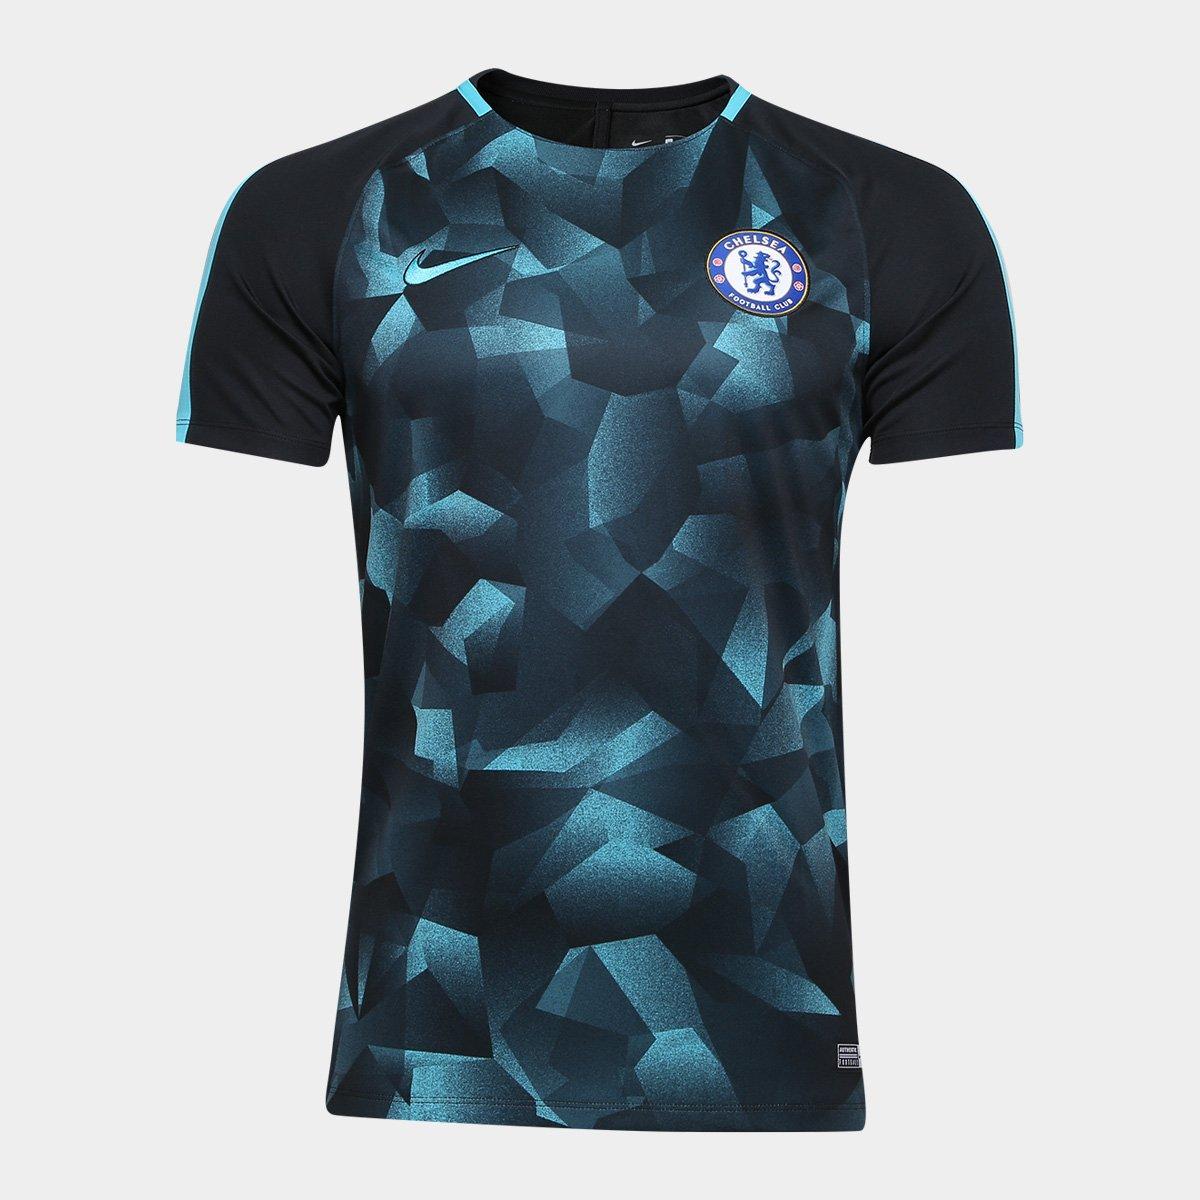 739b64f7d19f6 Camisa Chelsea Squad 17 18 s nº - Nike Masculina - Compre Agora ...